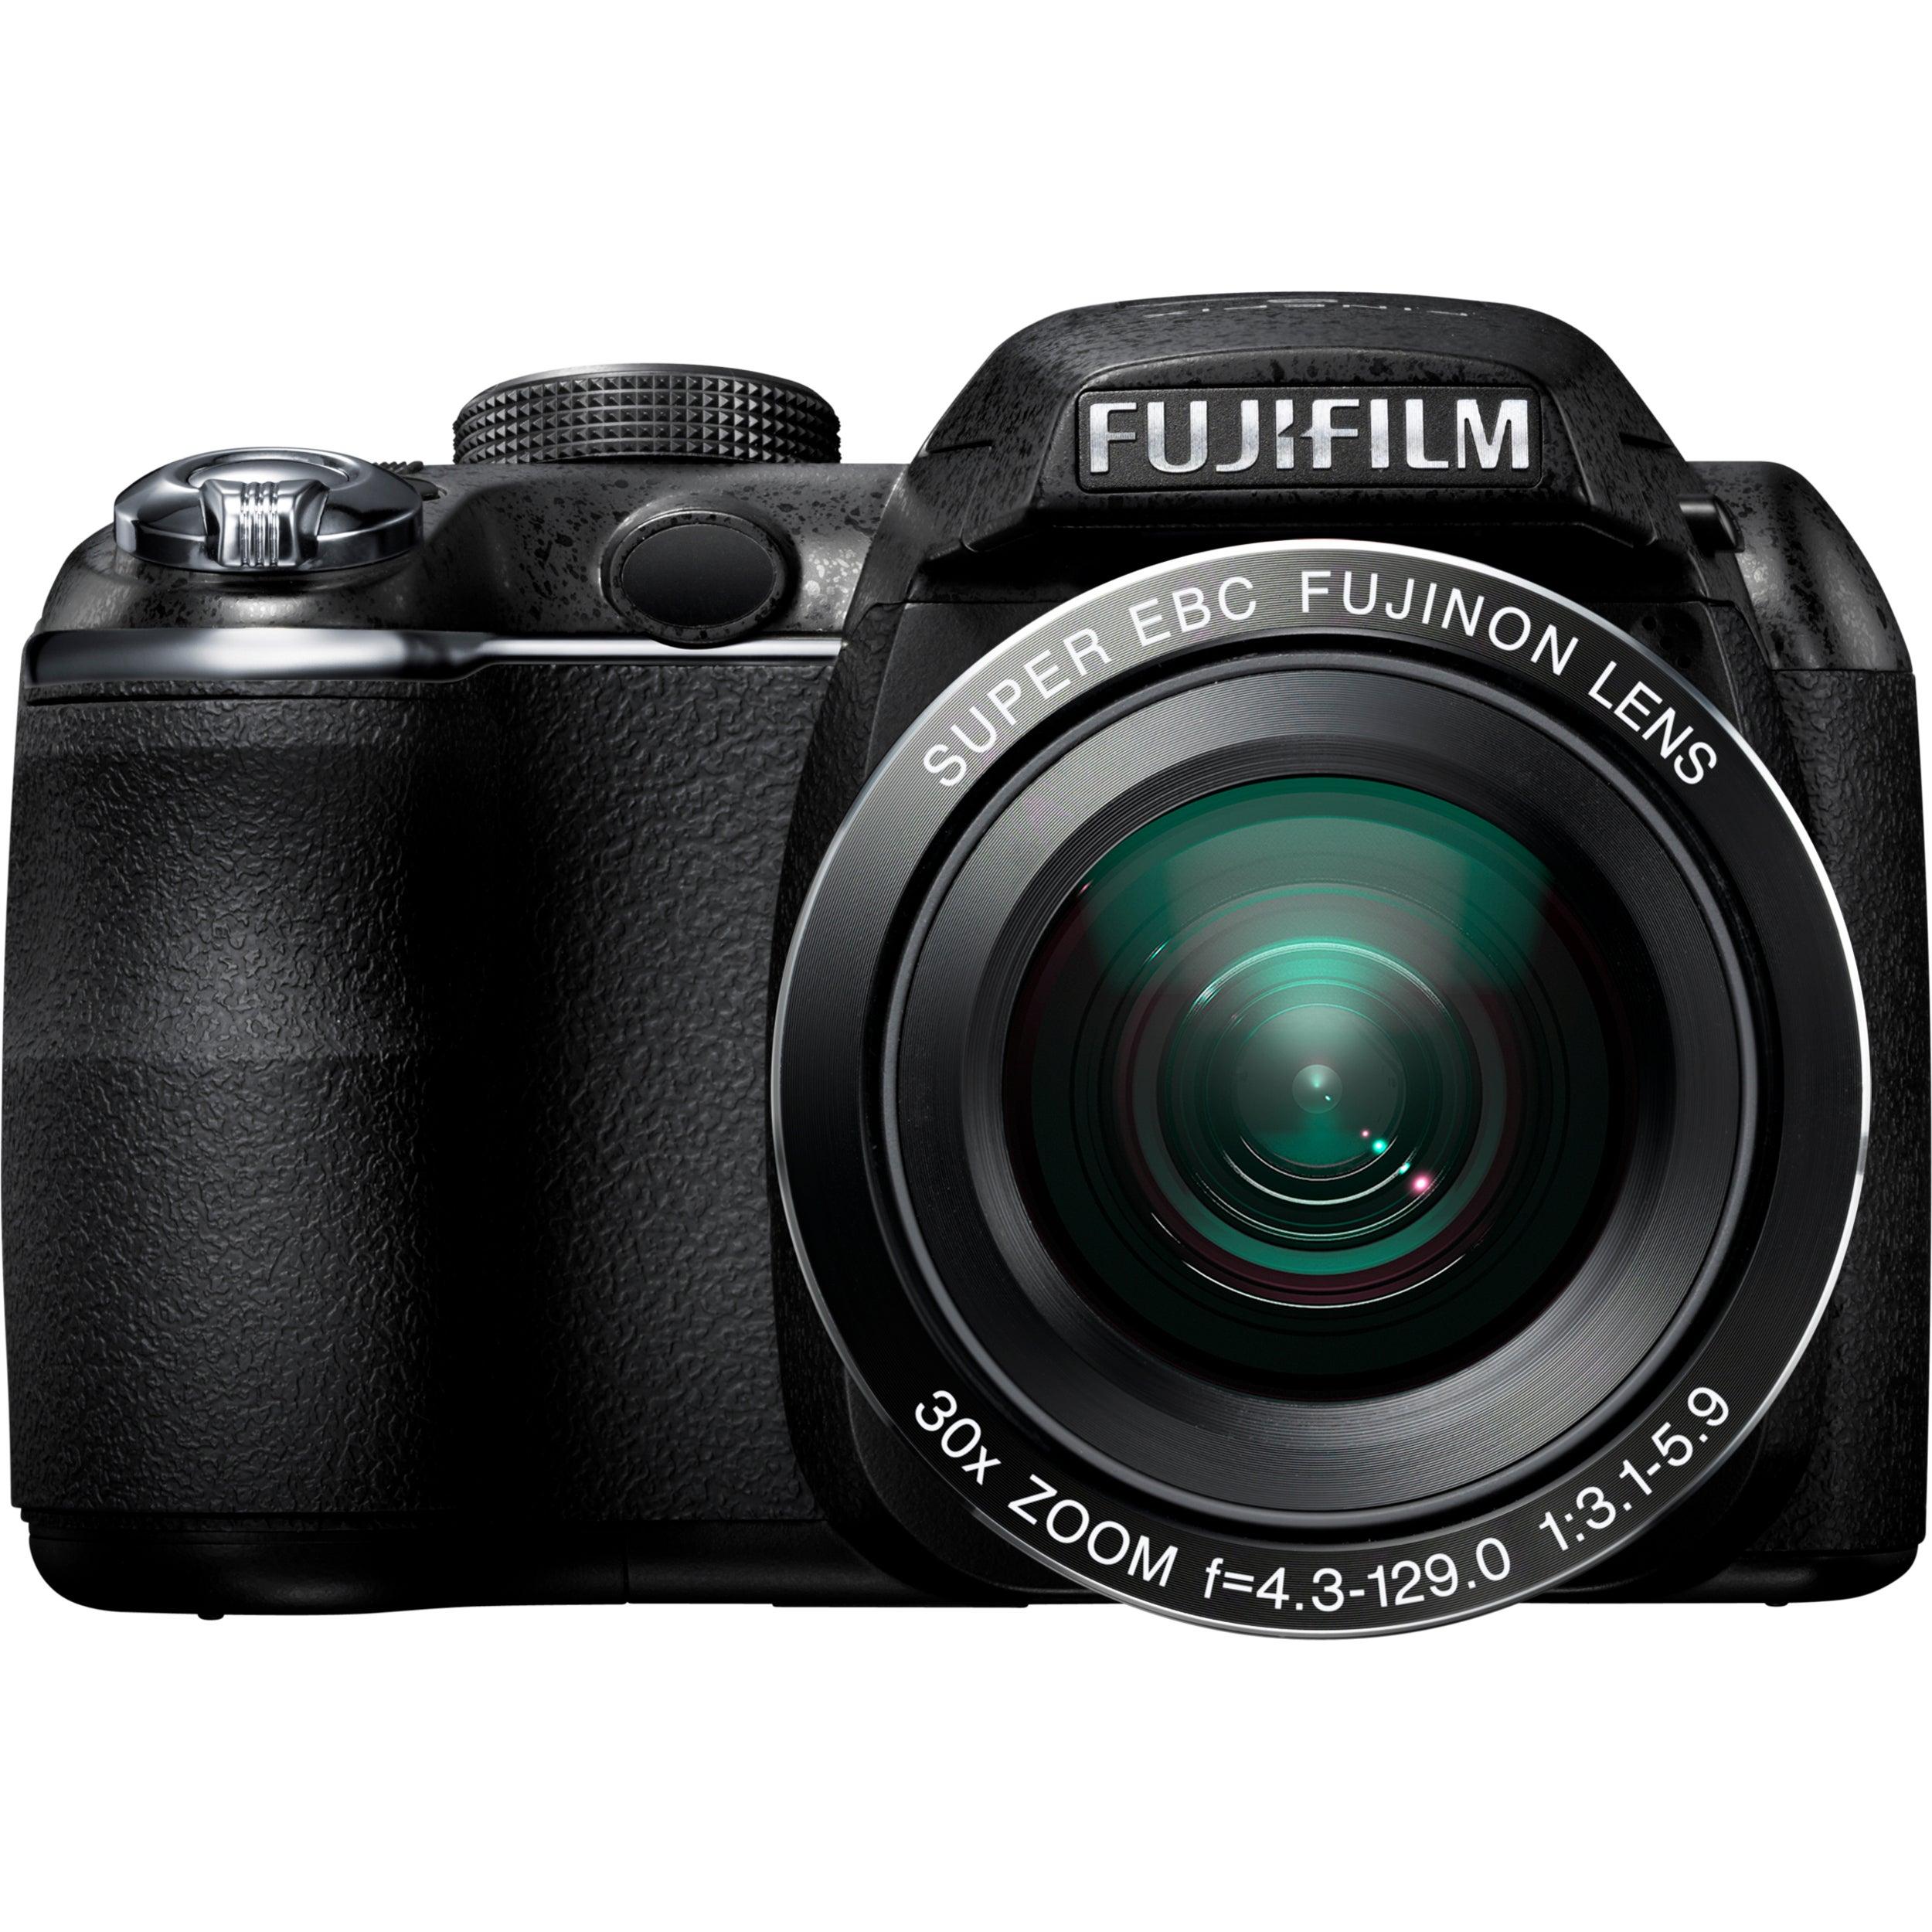 Fujifilm FinePix S4000 14 Megapixel Bridge Camera - Black